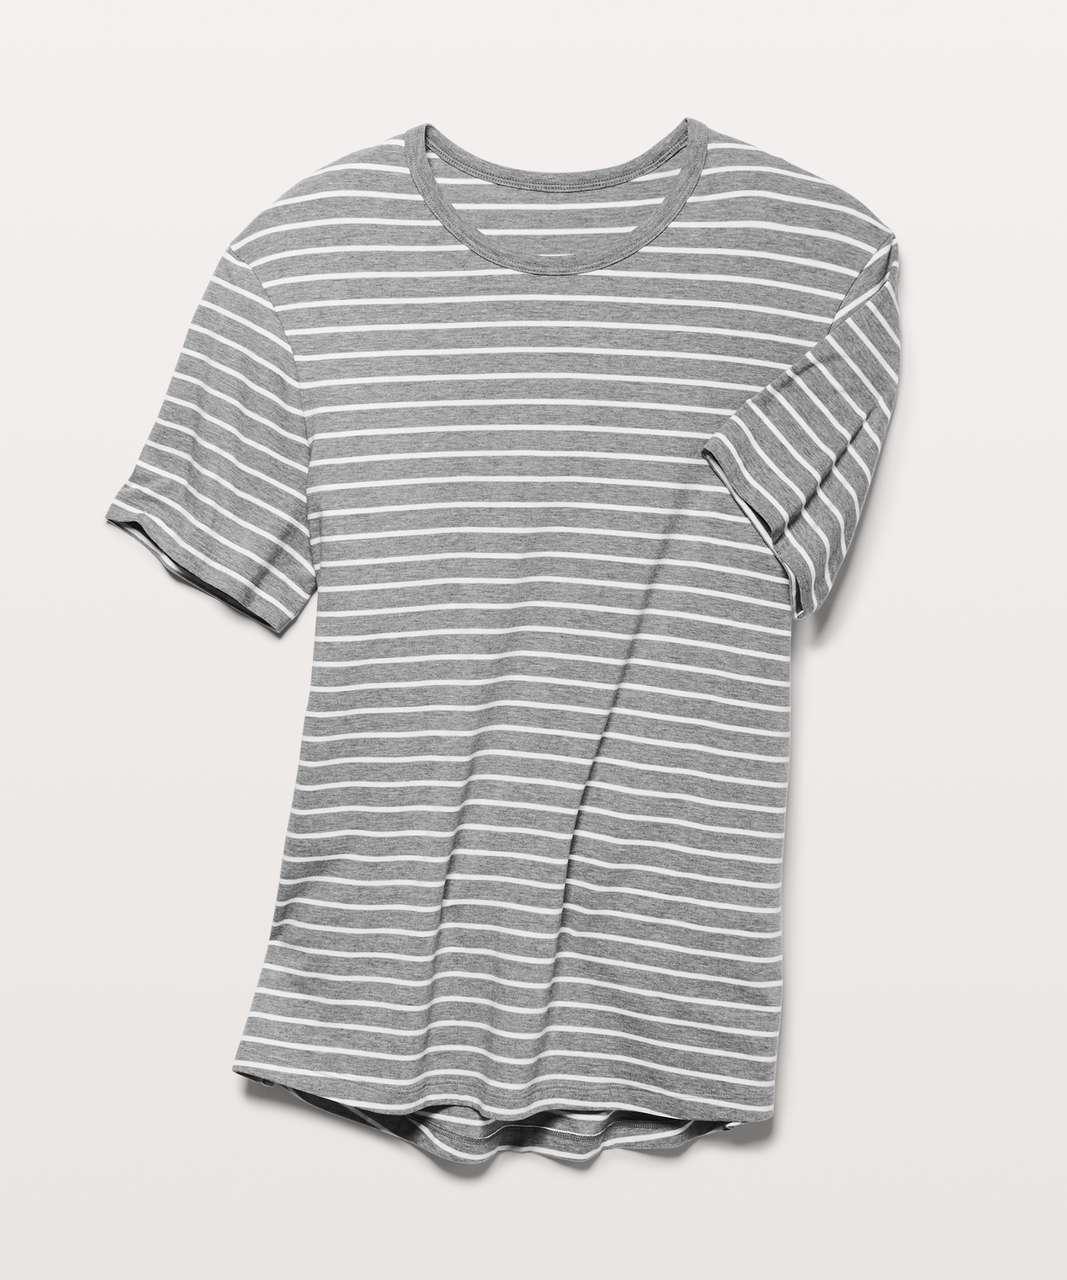 Lululemon 5 Year Basic Tee *Updated Fit - Quiet Stripe Heathered Medium Grey White